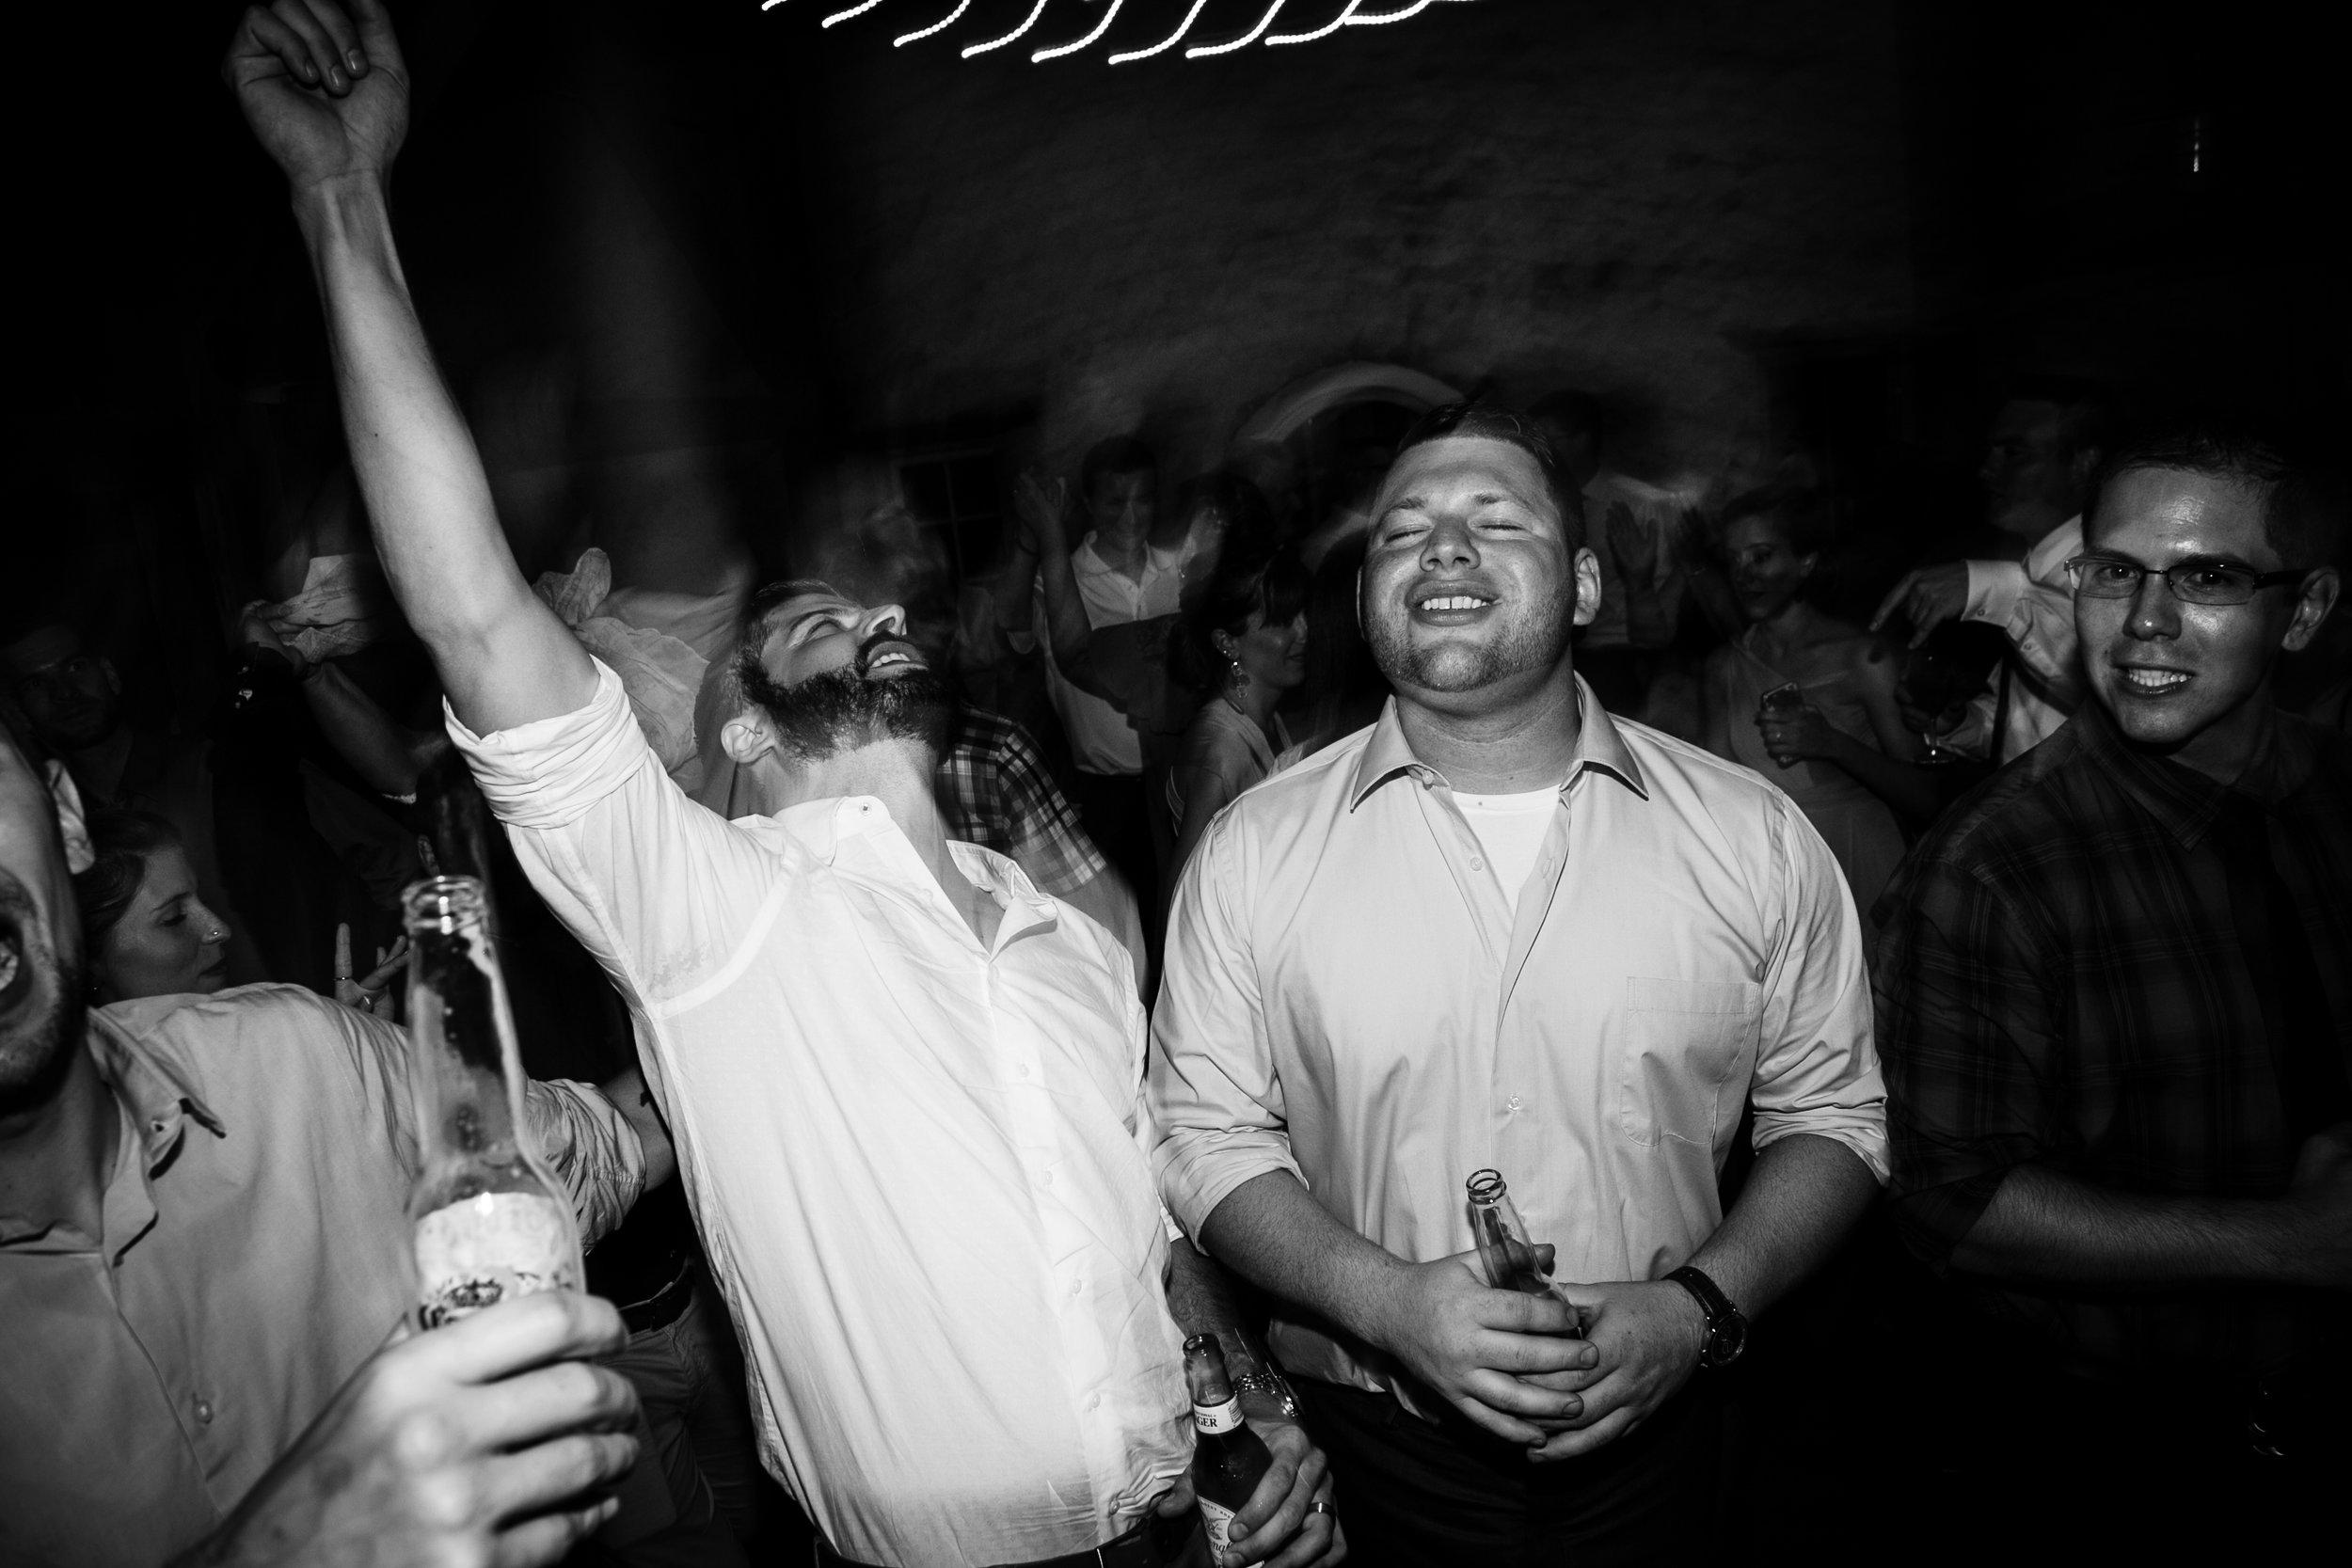 TYLER ARBORETUM WEDDING PHOTOGRAPHY LOVESTRUCK PICTURES-094.jpg